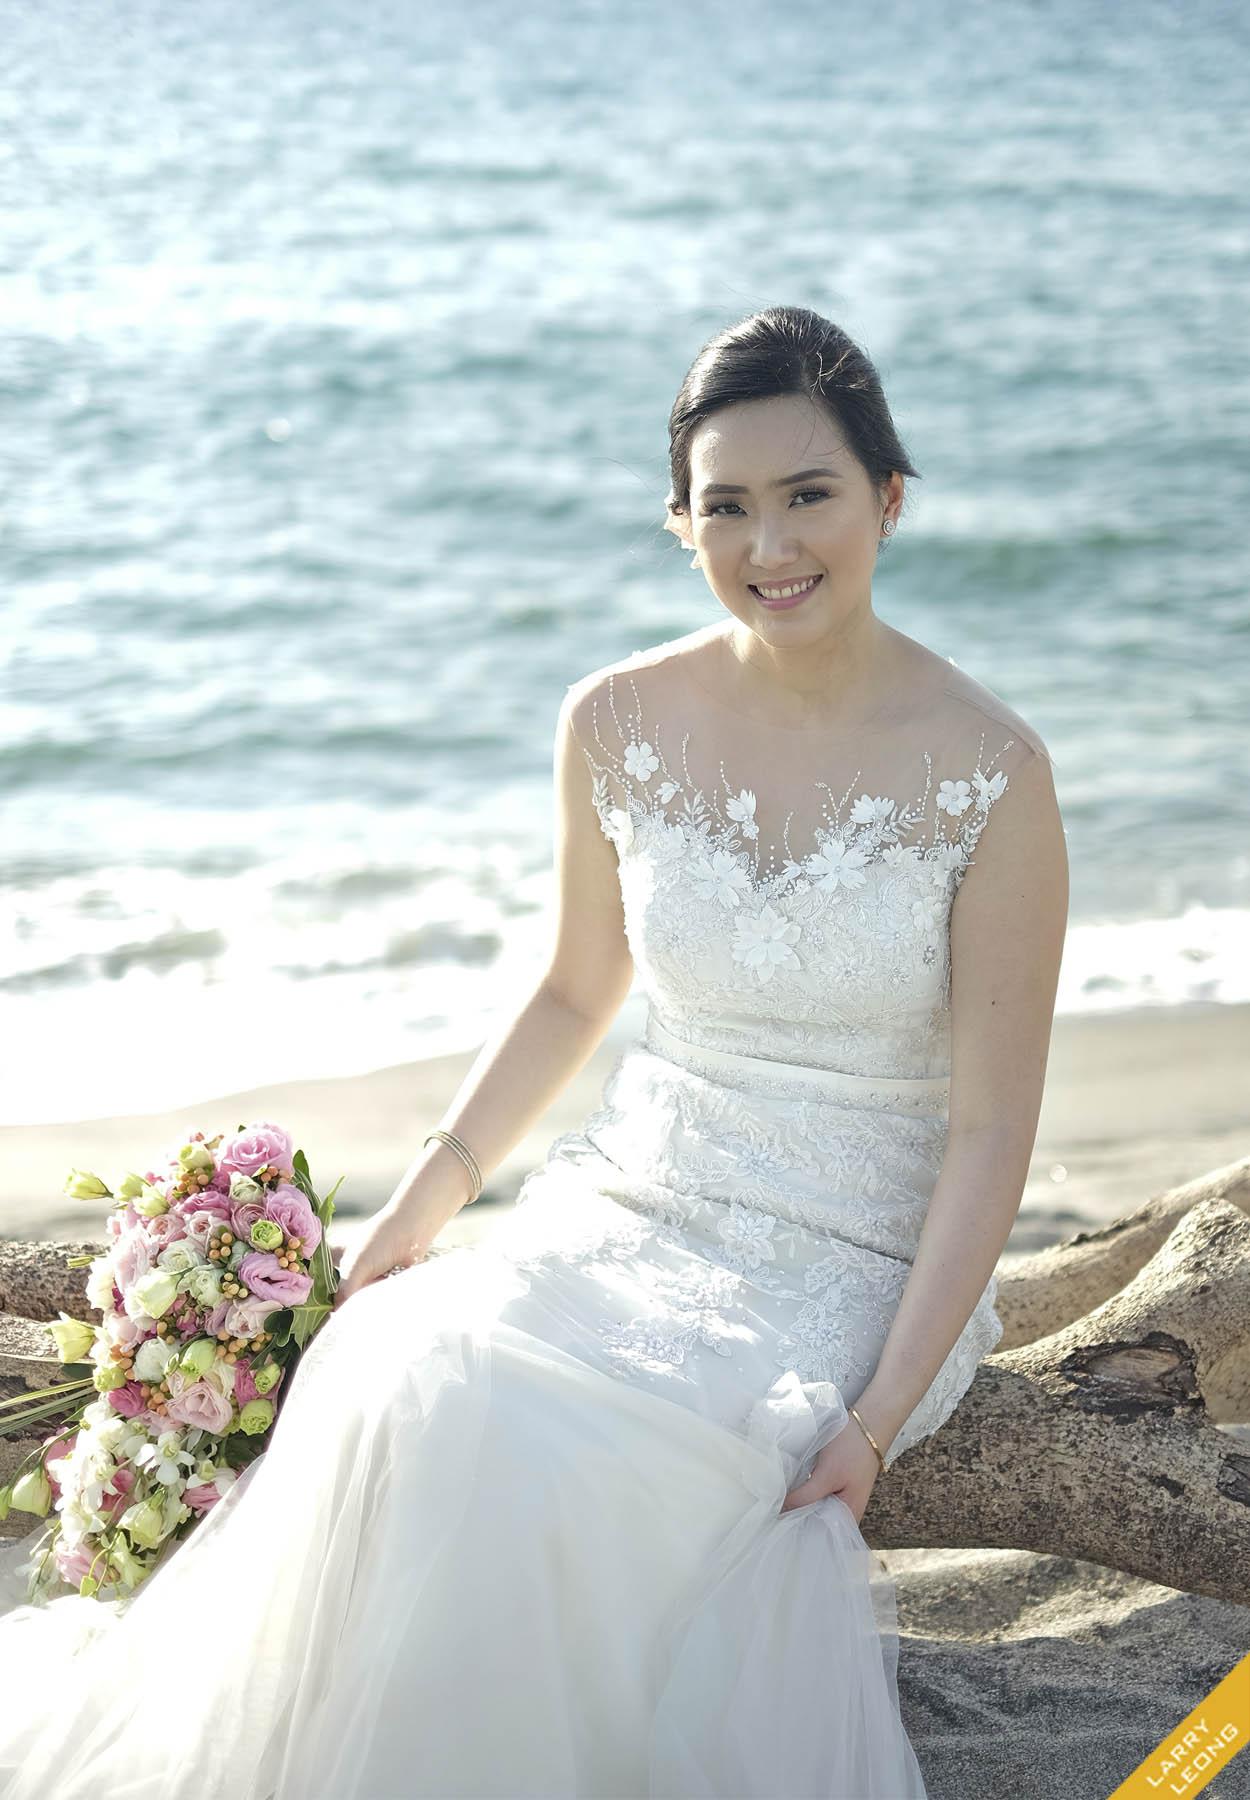 Terence & Jeraldine\'s Beach Wedding | Larry Leong